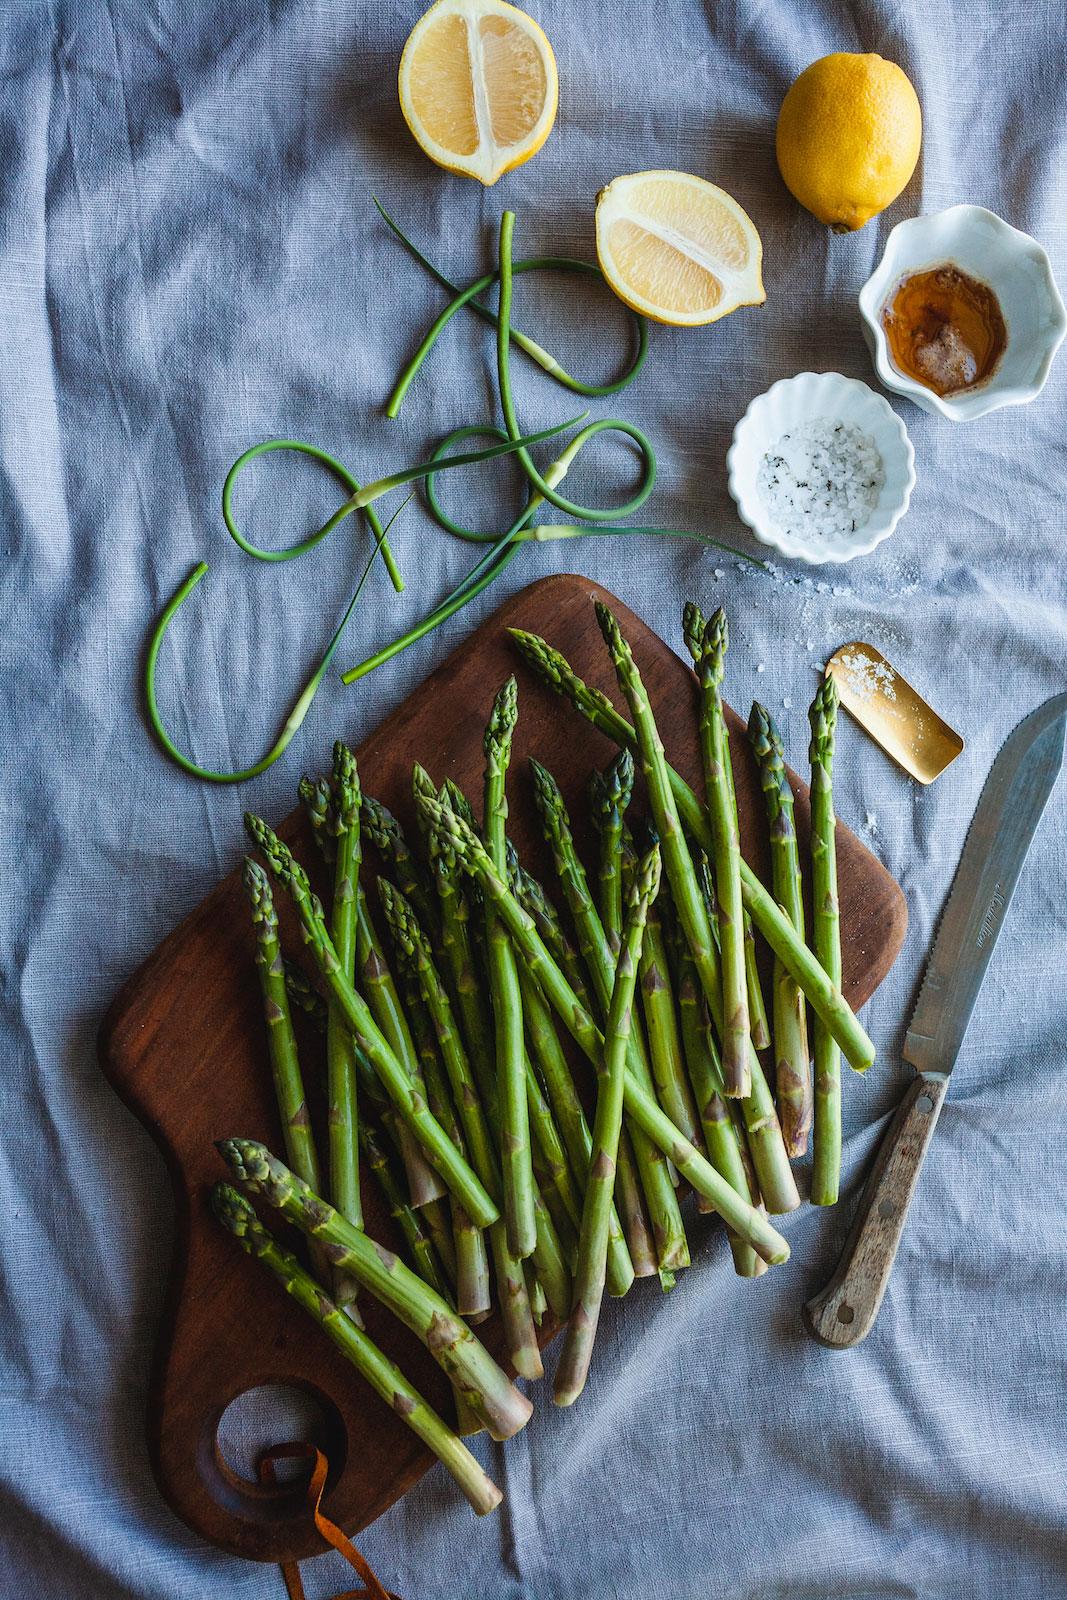 Brown Butter Lemon Garlic Grilled Asparagus